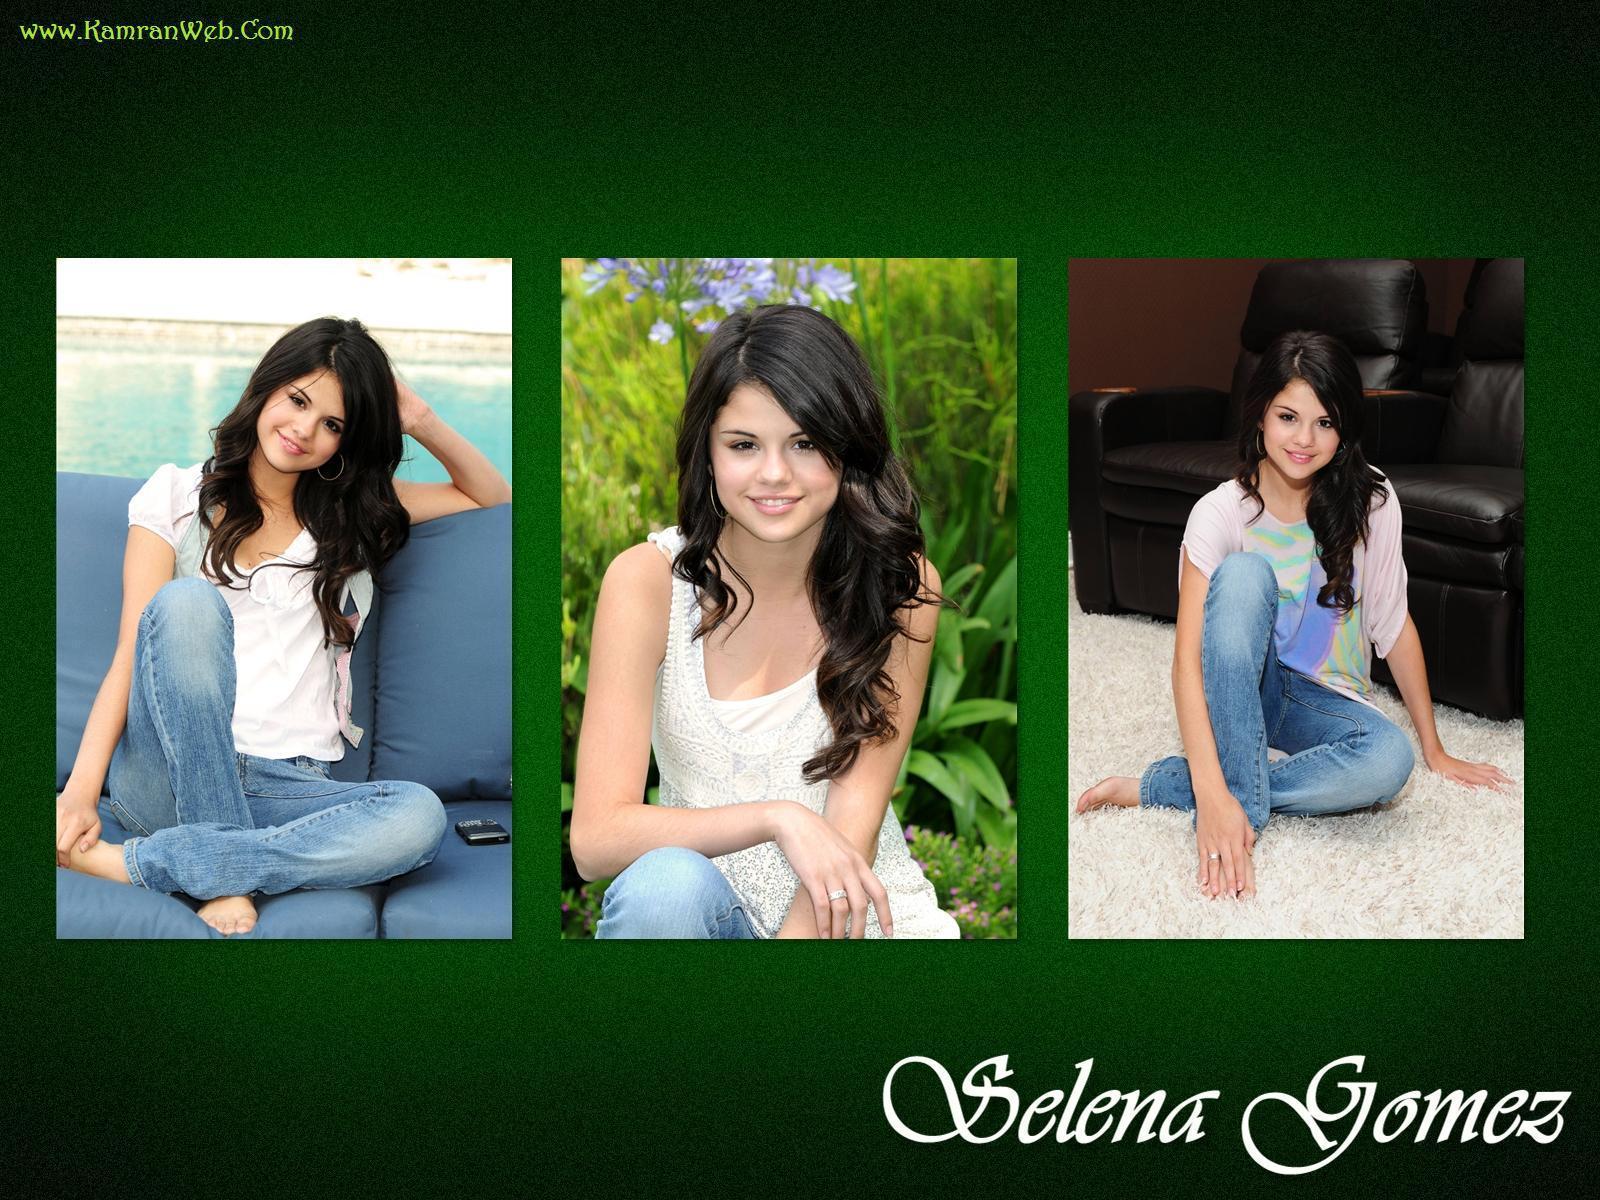 http://images2.fanpop.com/image/photos/9200000/selena_wallpaper-selena-gomez-9289384-1600-1200.jpg